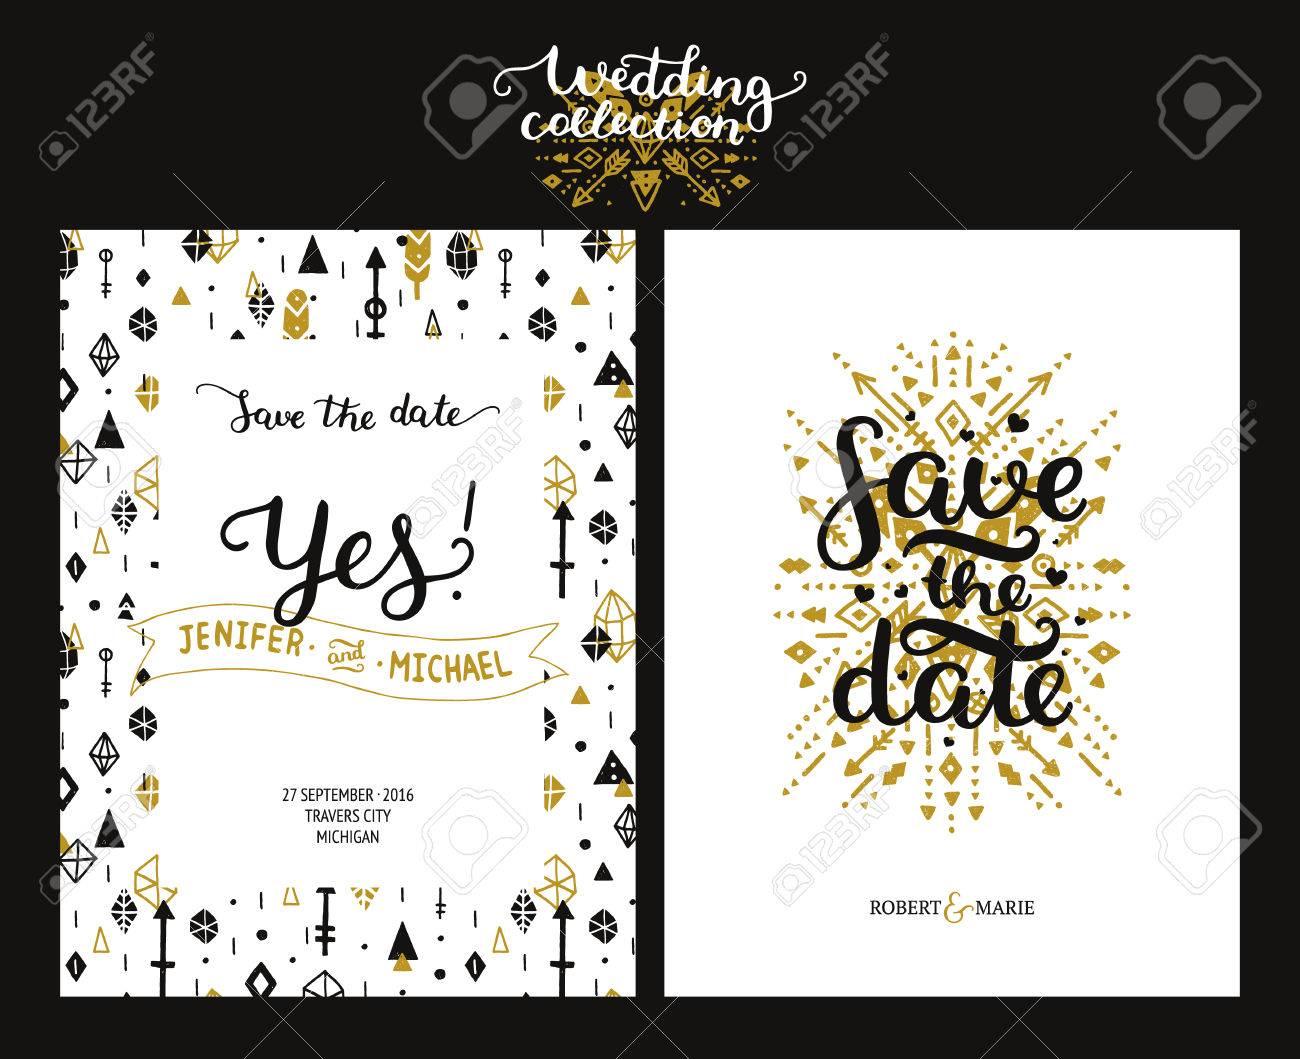 Save the date cards boho wedding invitation with hand drawn save the date cards boho wedding invitation with hand drawn text feathers arrows stopboris Choice Image